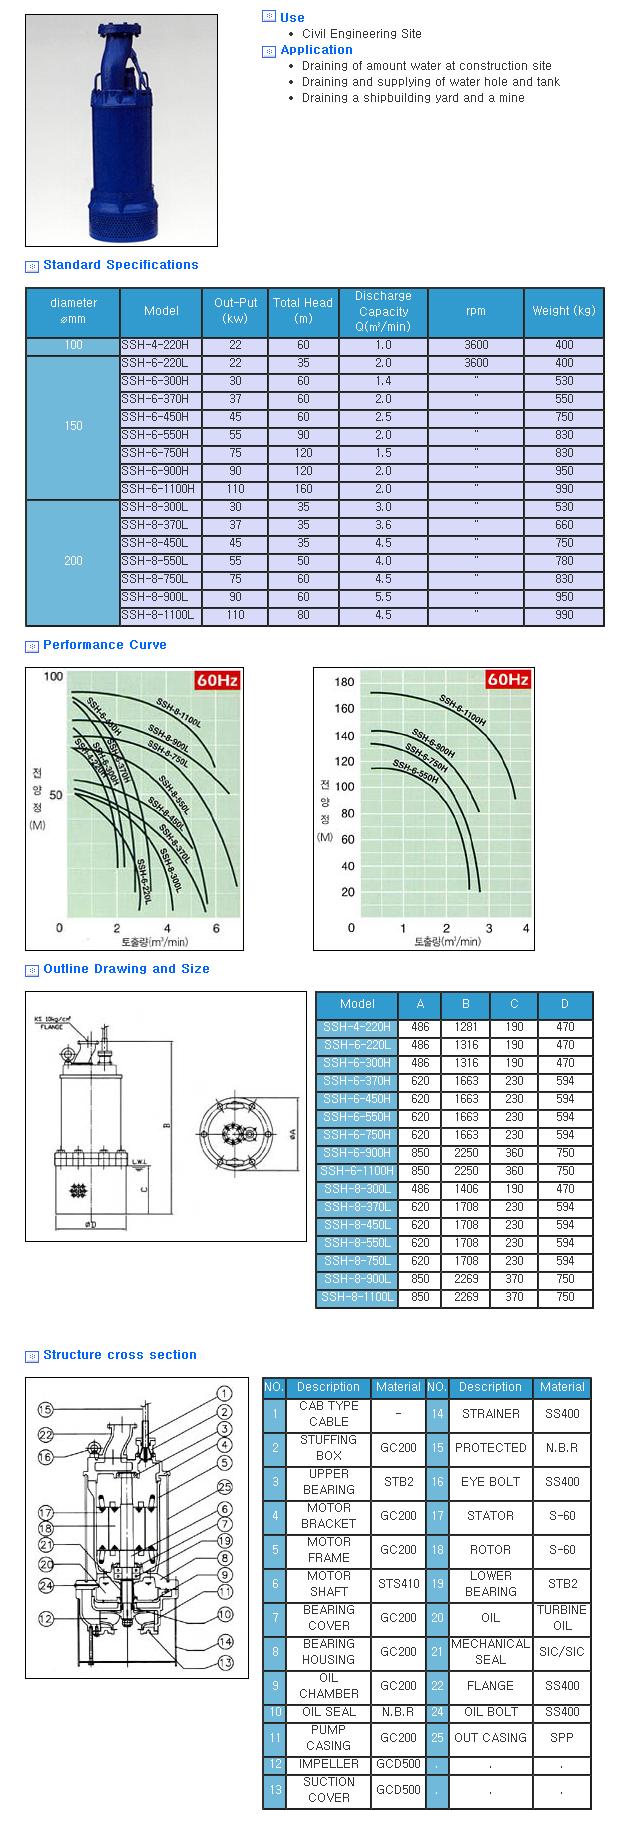 Shinshin Pump Manufacturing Co. High Head Pump for Civil Engineering Site SSH